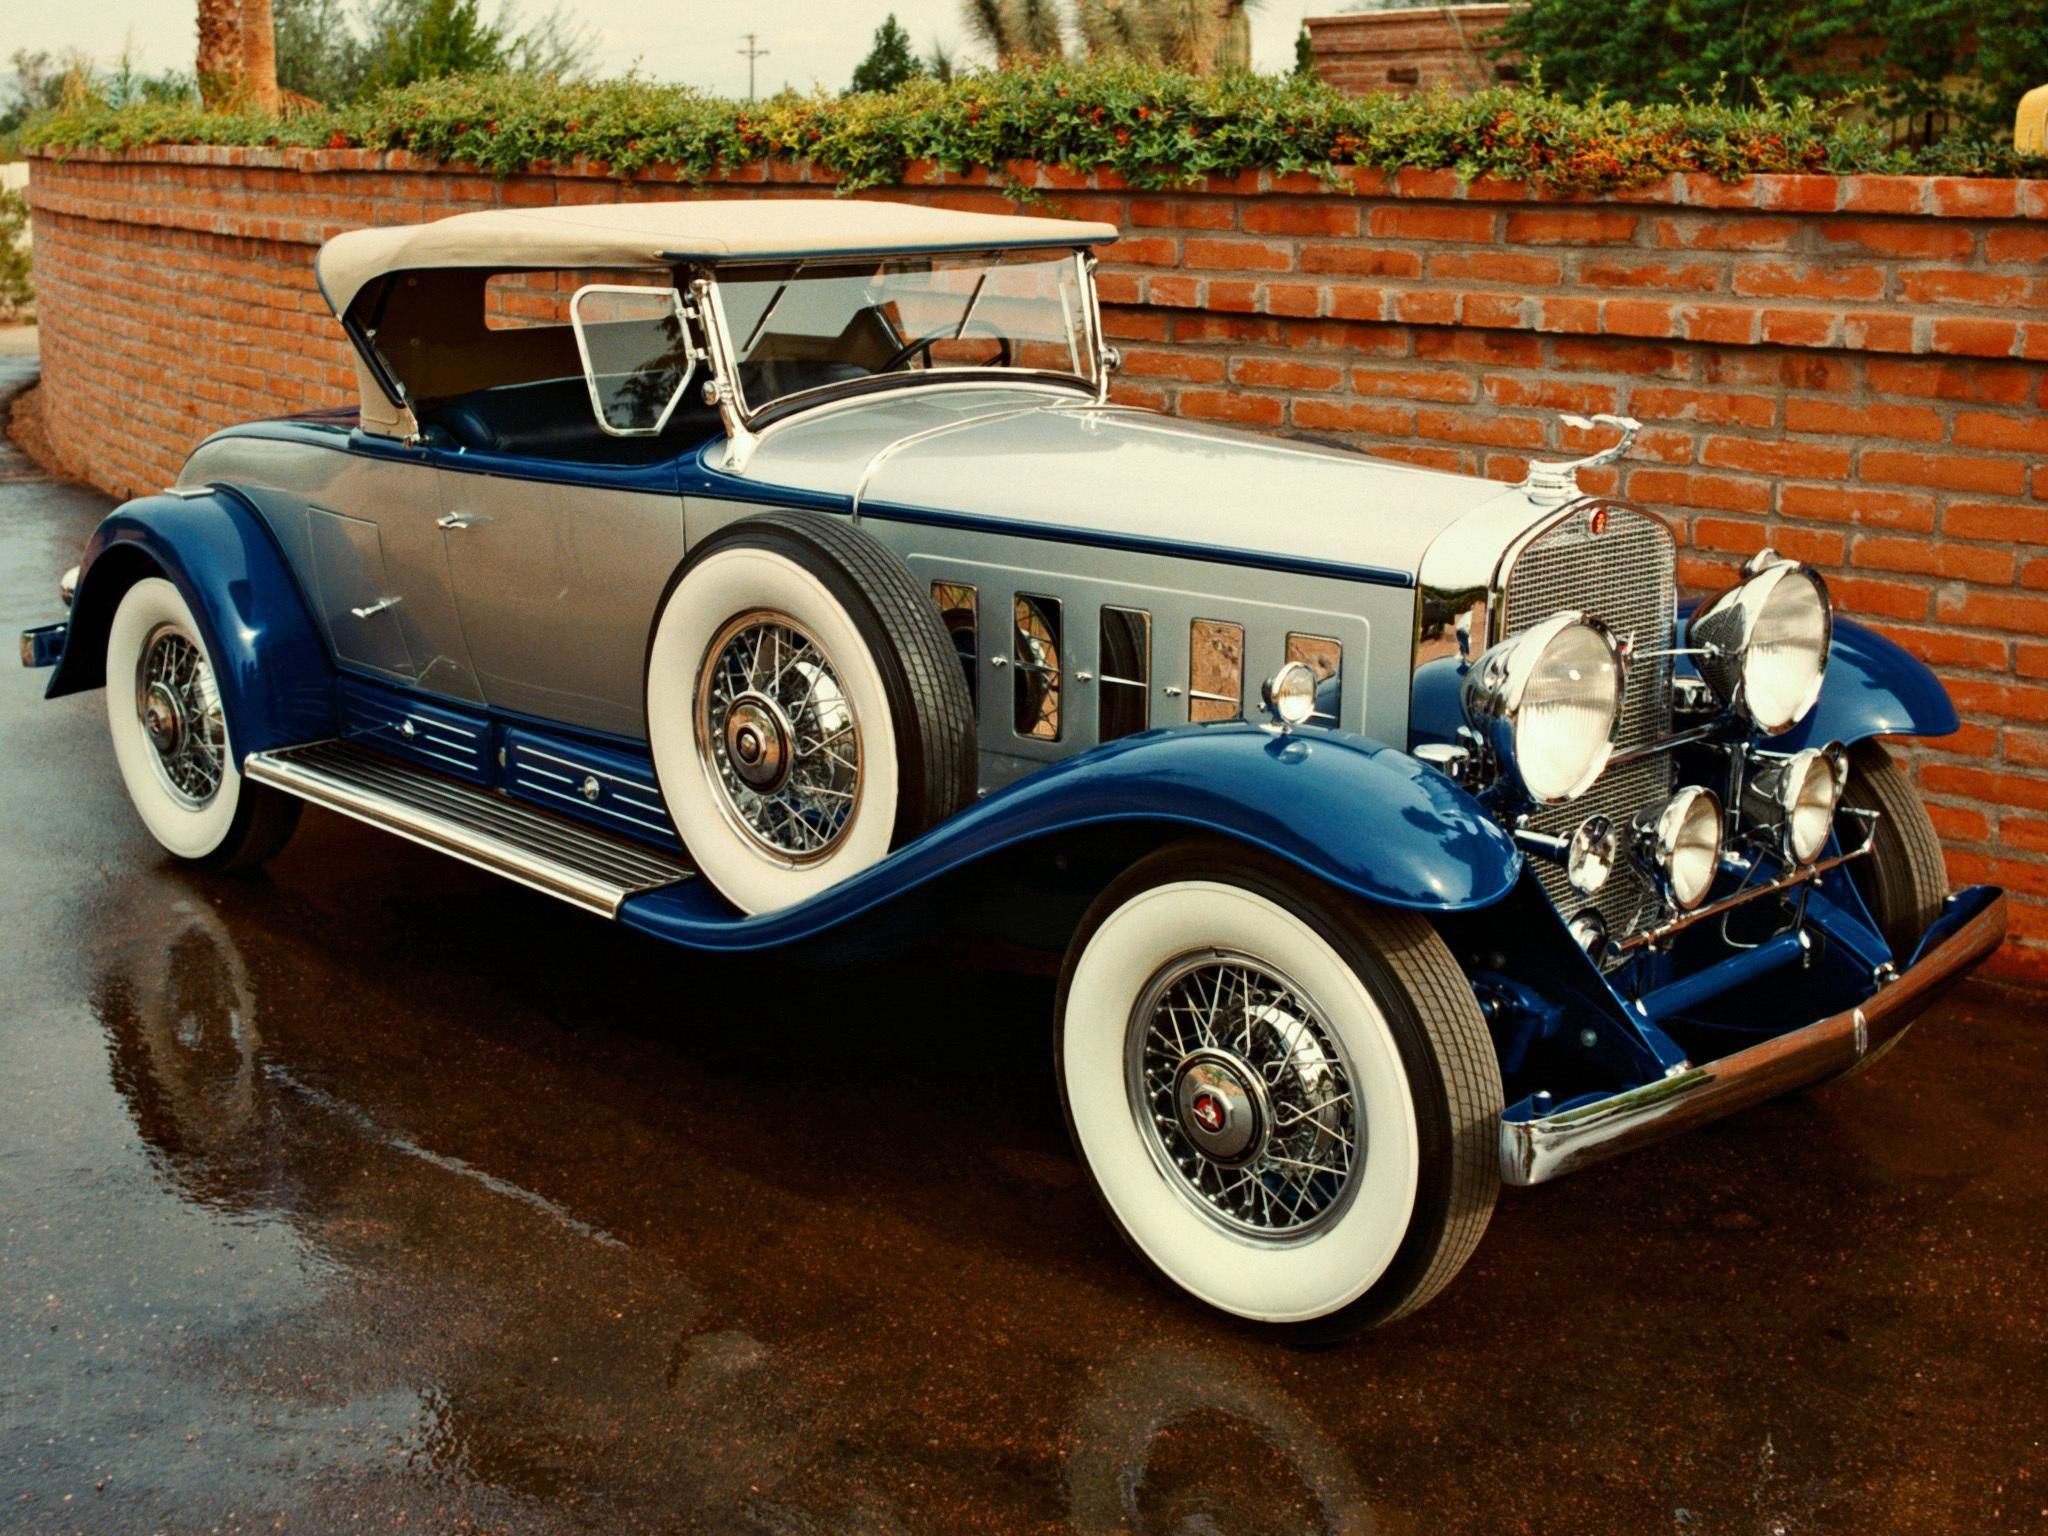 cadillac amerikanische oldtimer classic cars us pinterest oldtimer classic. Black Bedroom Furniture Sets. Home Design Ideas